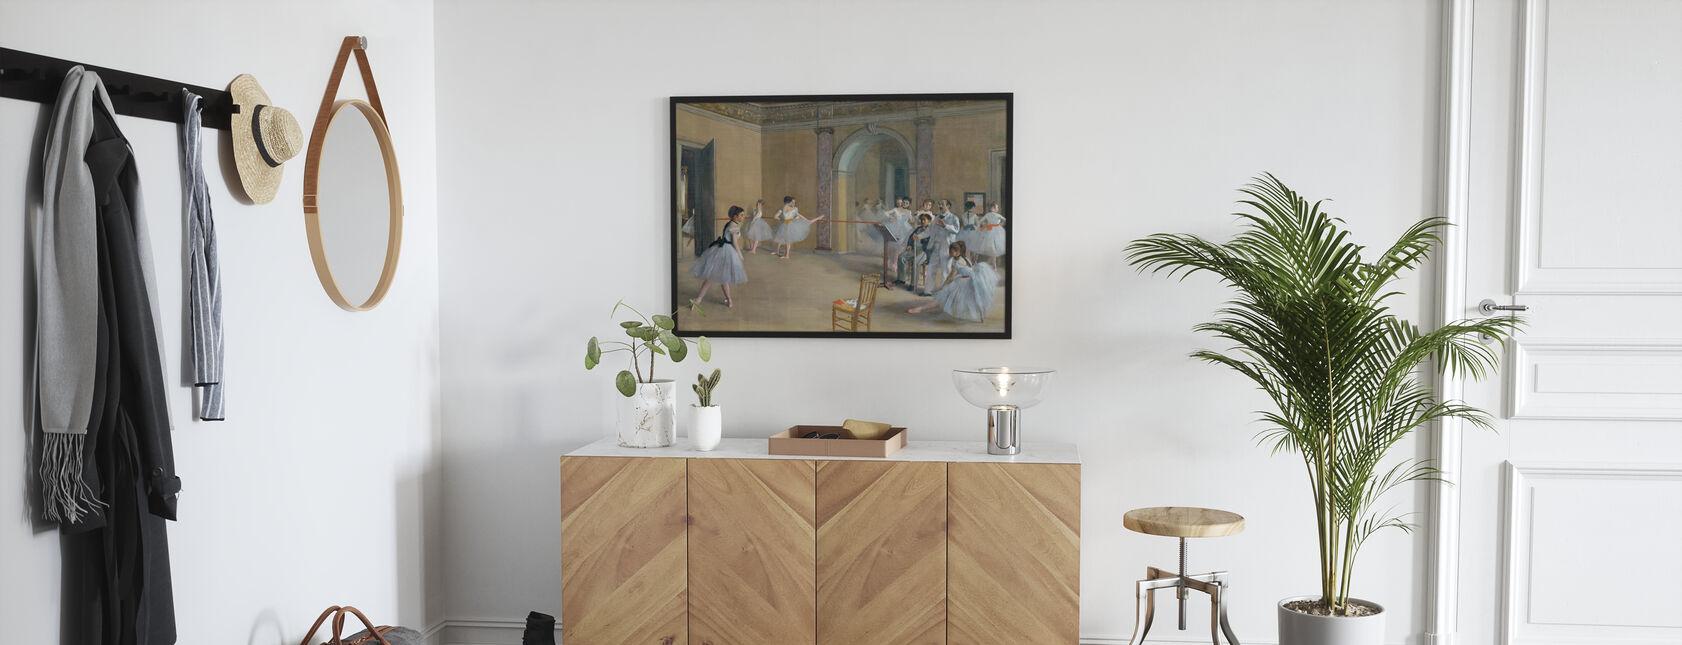 Foyer di danza all'Opera - Edgar Degas - Poster - Sala